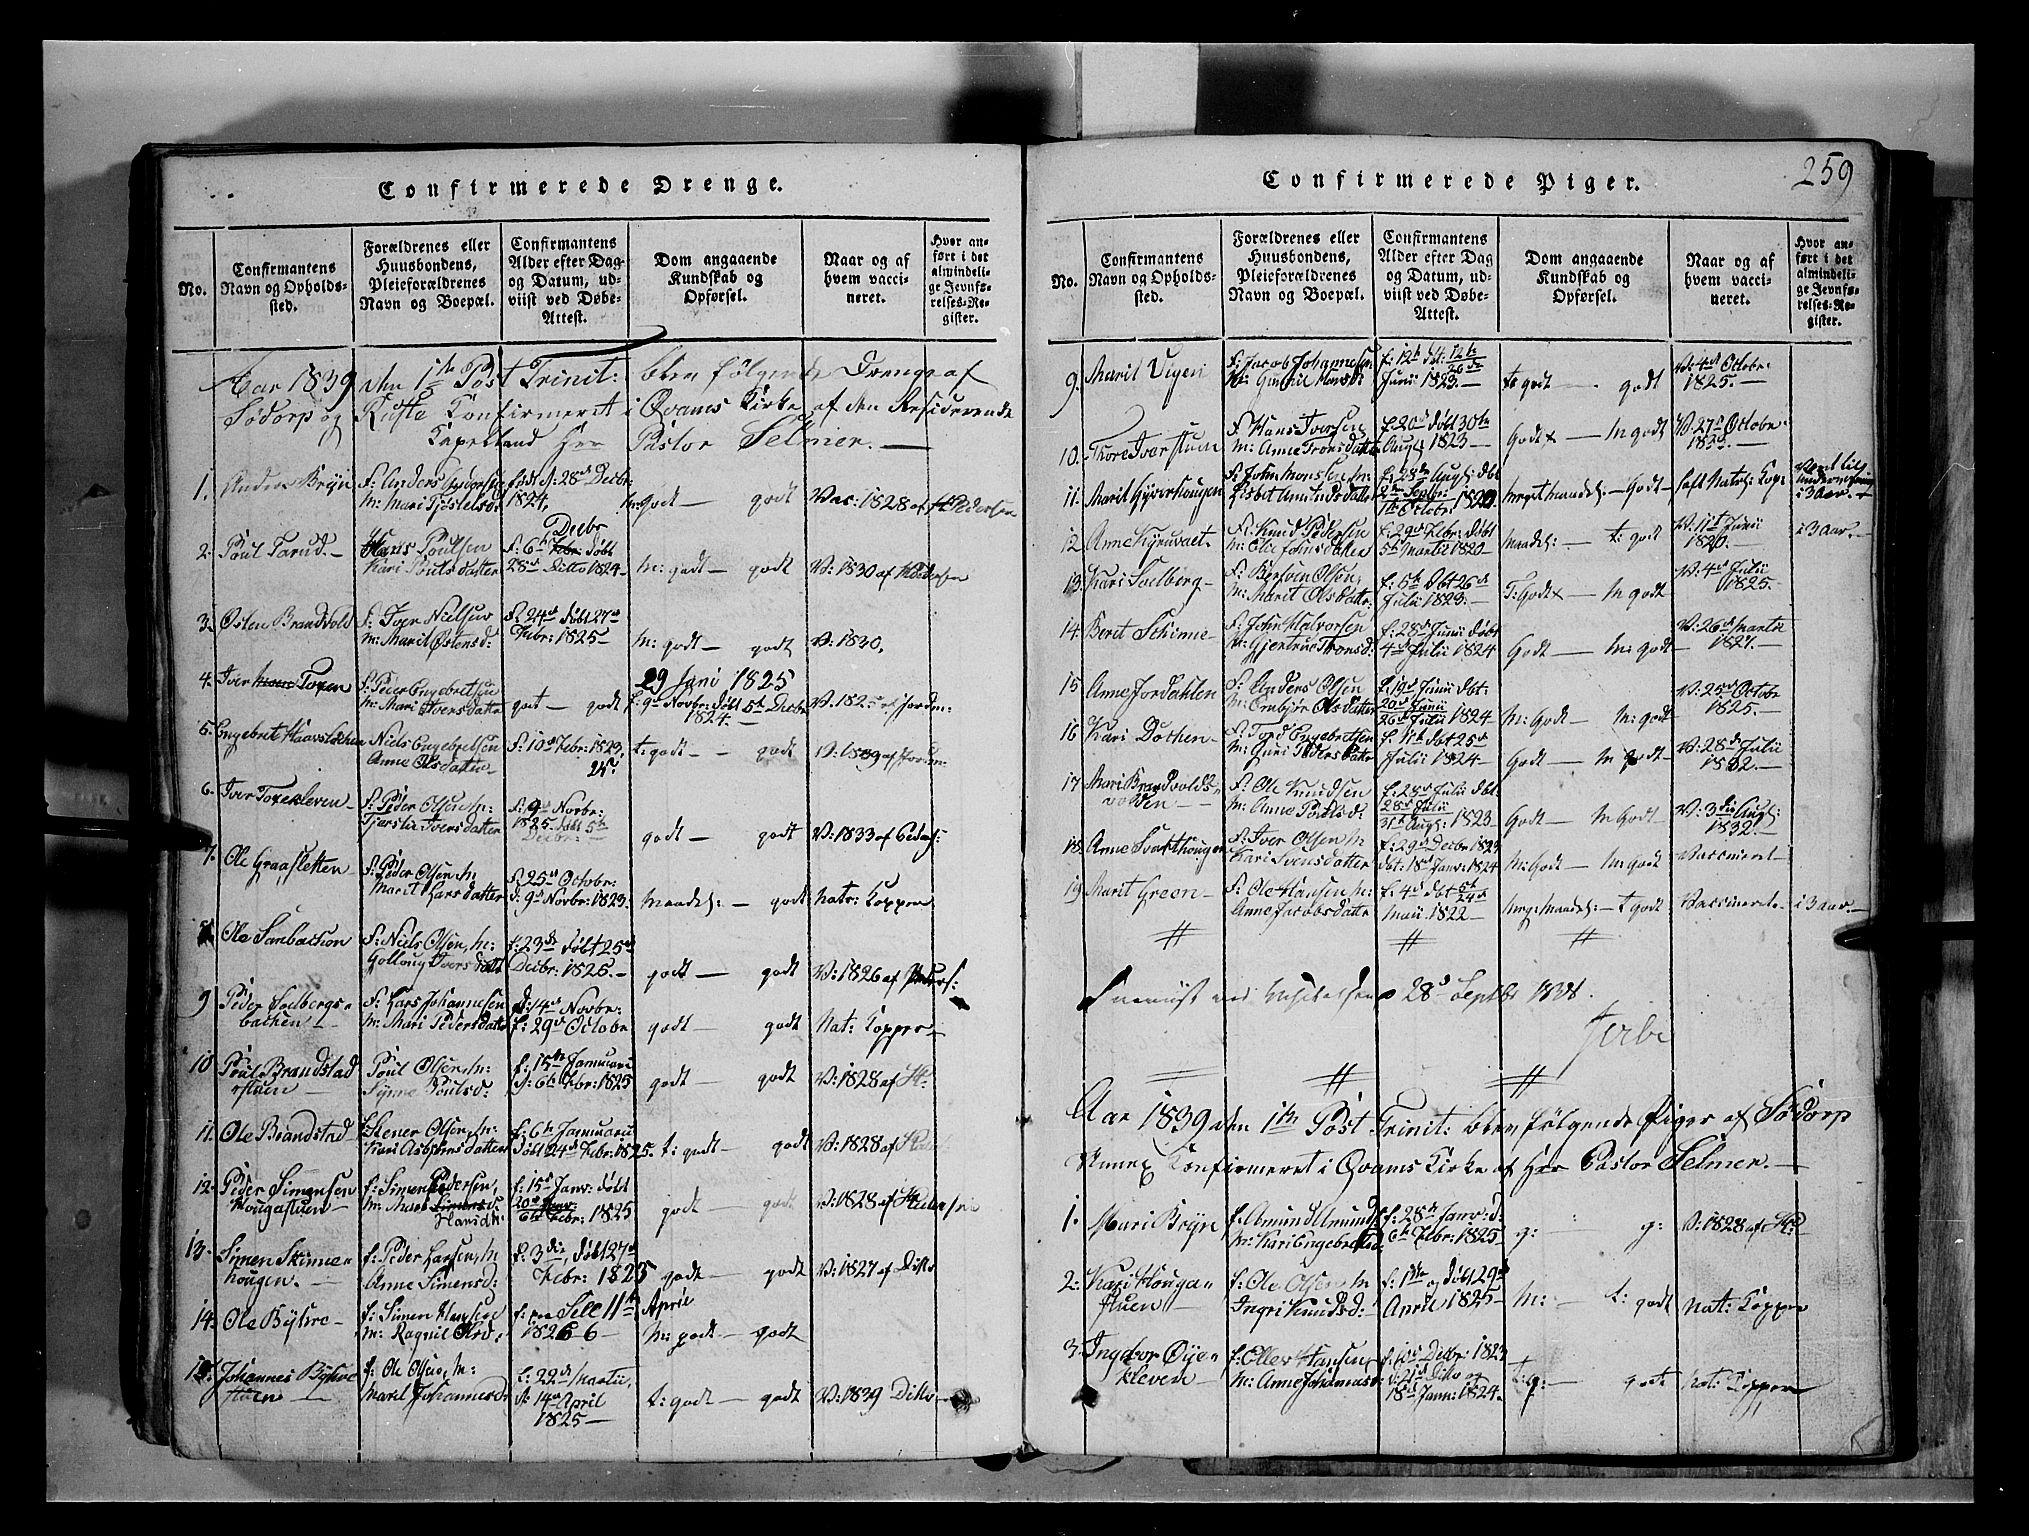 SAH, Fron prestekontor, H/Ha/Hab/L0004: Klokkerbok nr. 4, 1816-1850, s. 259